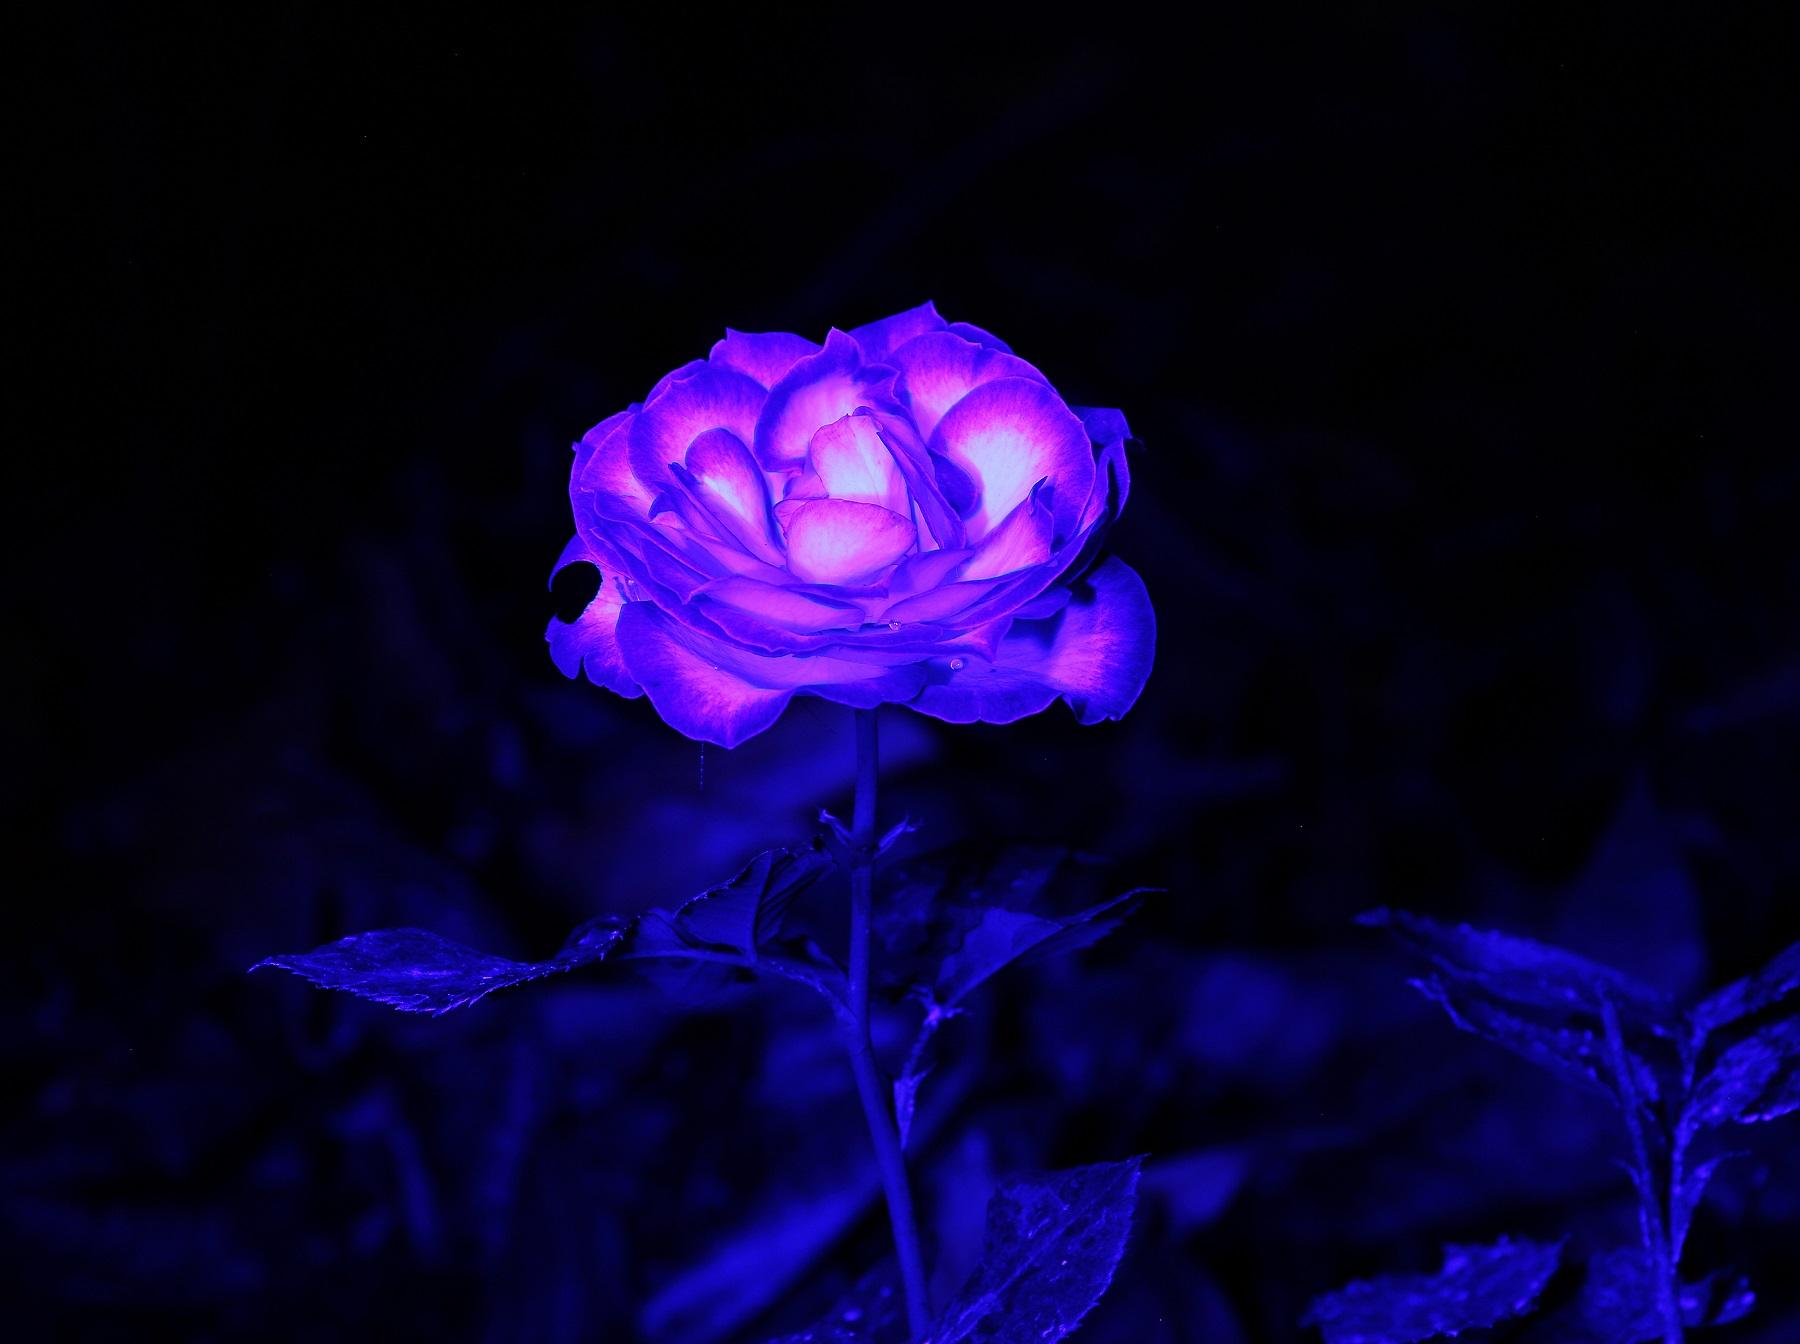 blue light rose